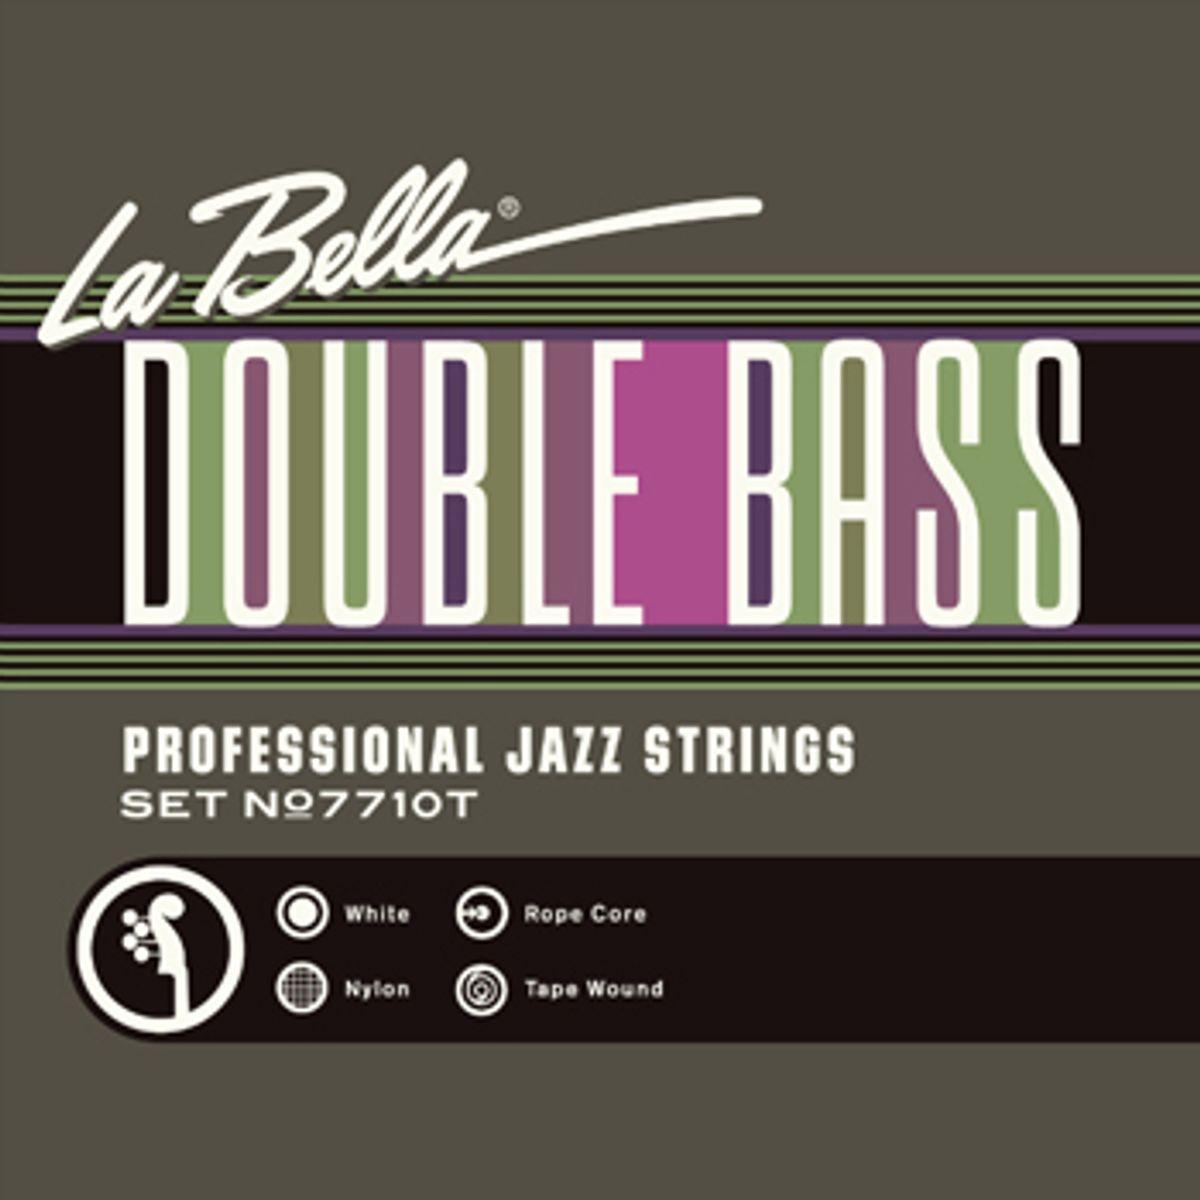 LaBella Strings Revamps Nylon Tape Wound Series